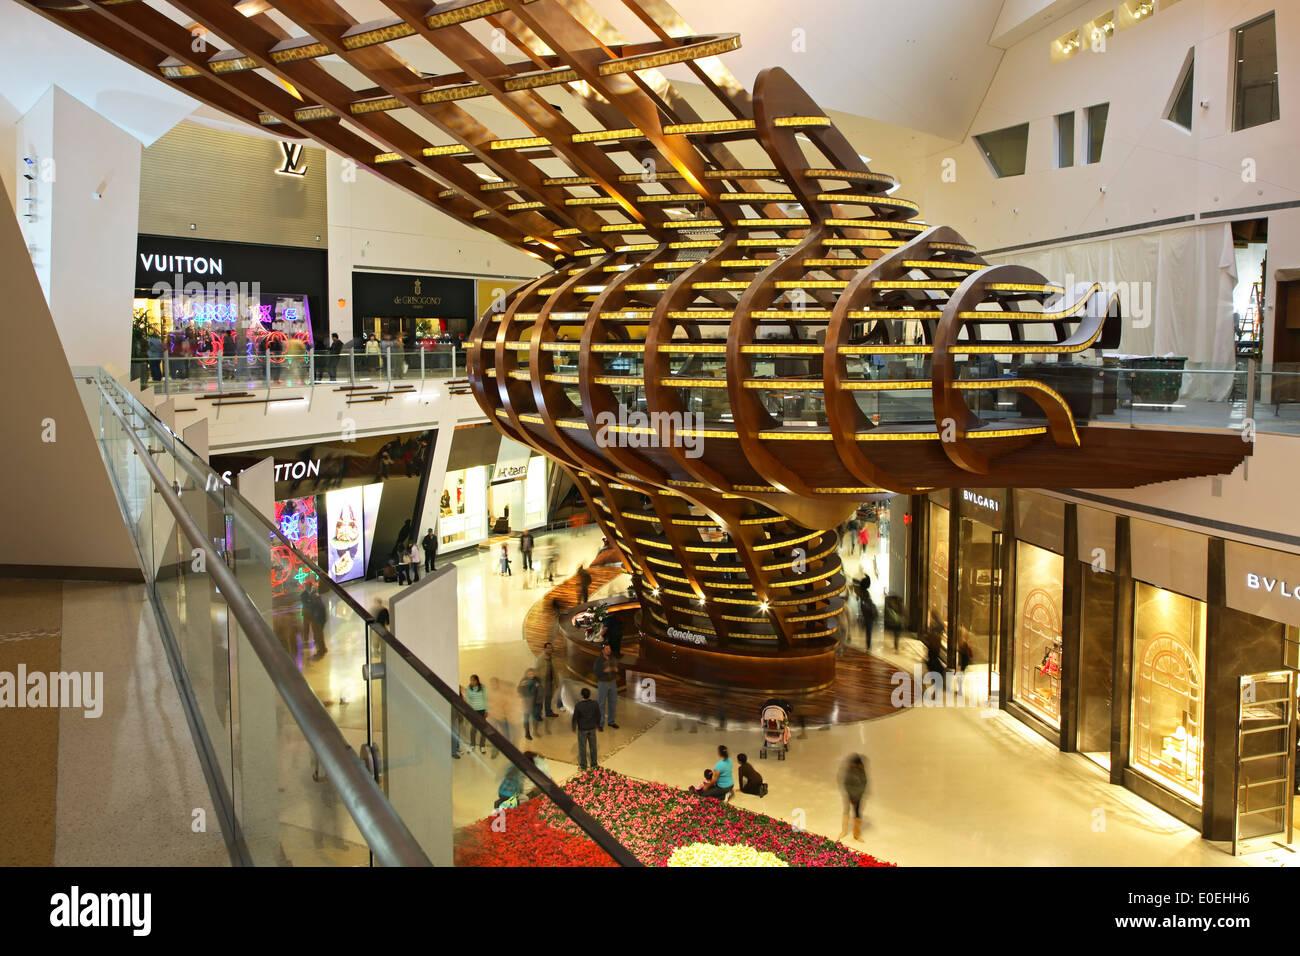 Interior of Crystal Shopping Mall, City Center, Las Vegas, Nevada USA - Stock Image